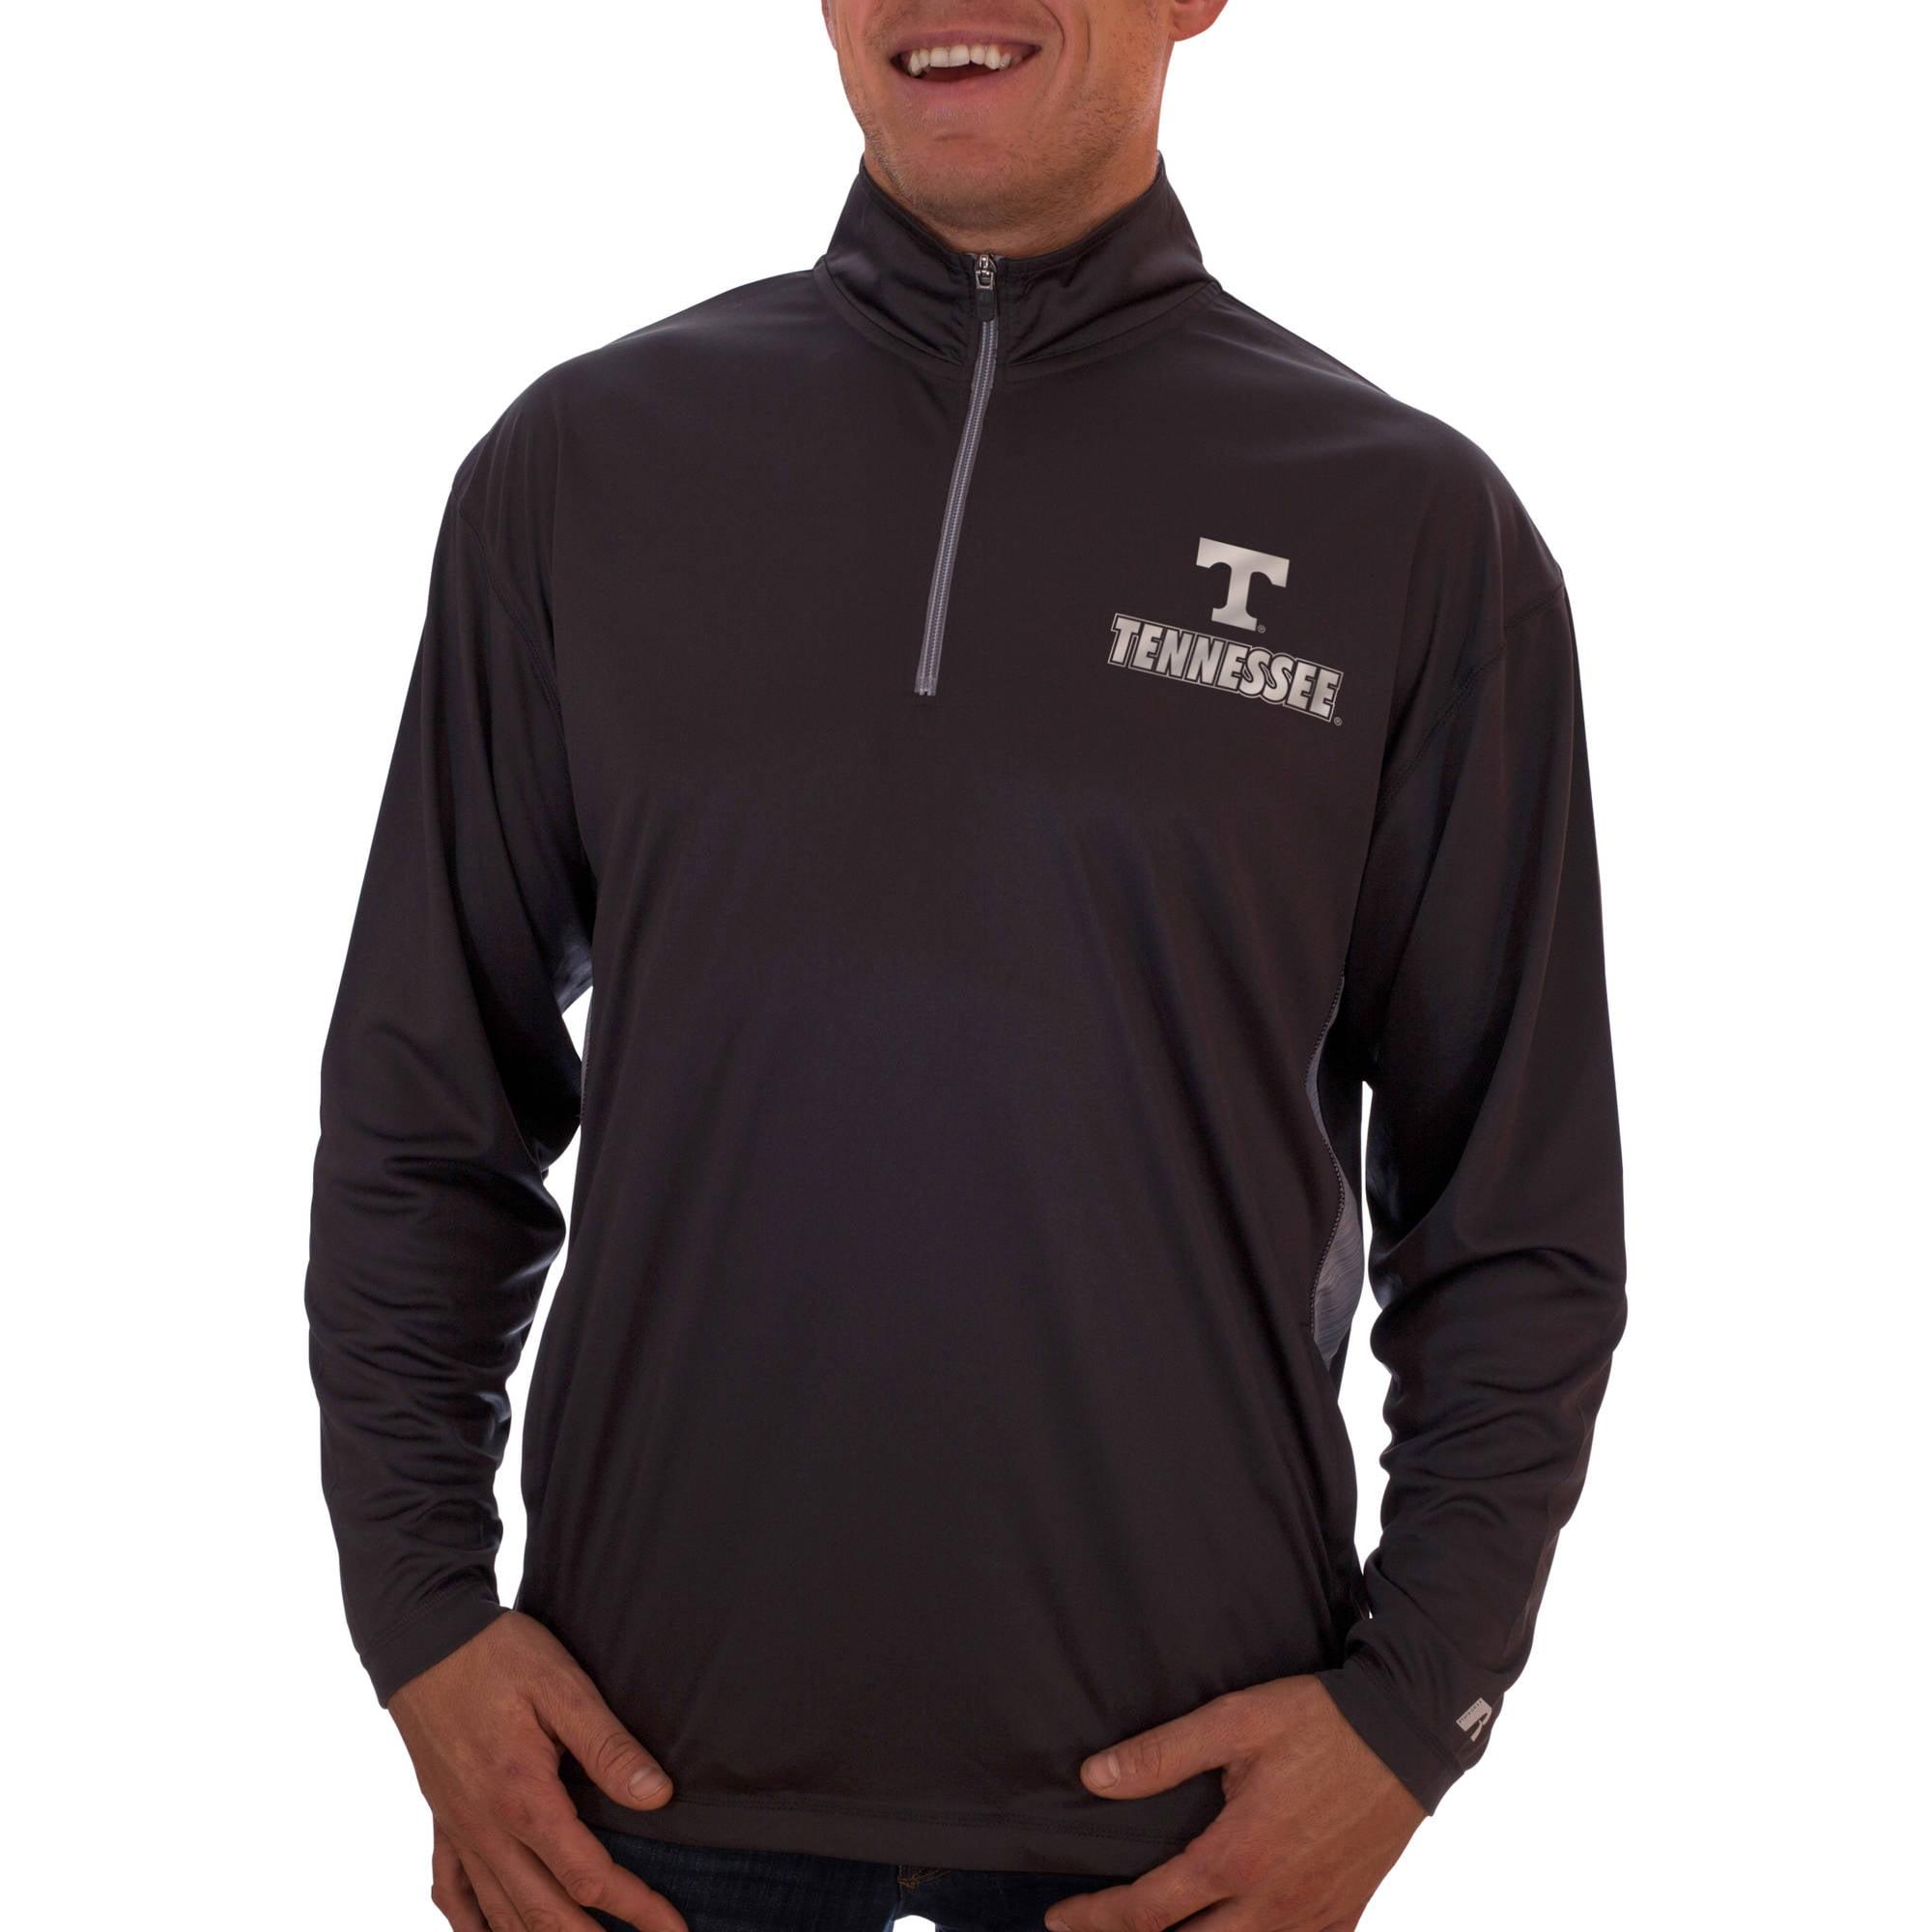 Russell NCAA Tennessee Volunteers Men's Athletic Fit Black/ Storm Gray 1/4-Zip Fitness Jacket